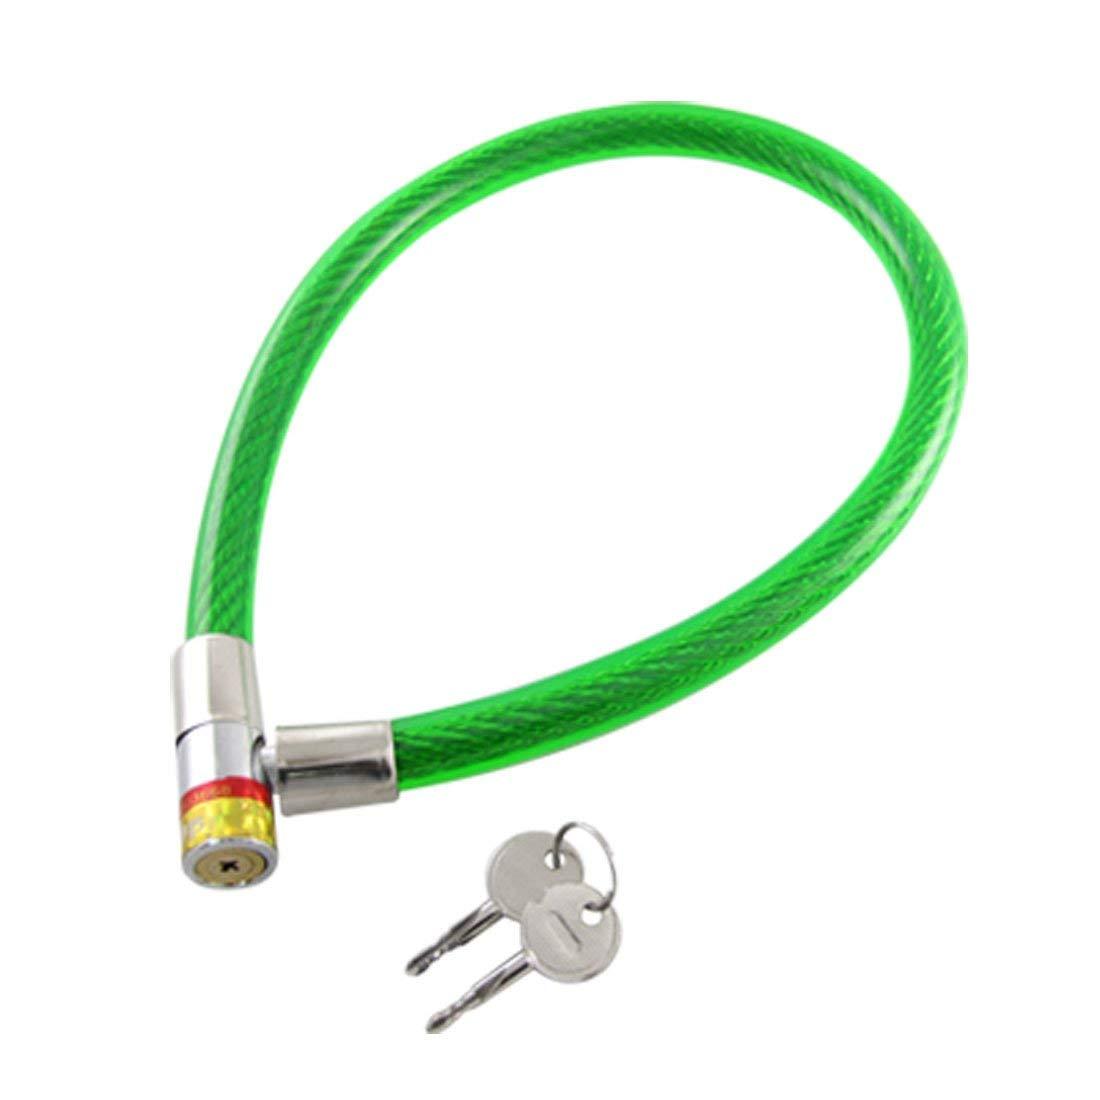 Aexit 2 Keys Bike Locks Durable Metal Coil Flexible Cable Bicycle U-Locks Bike Lock